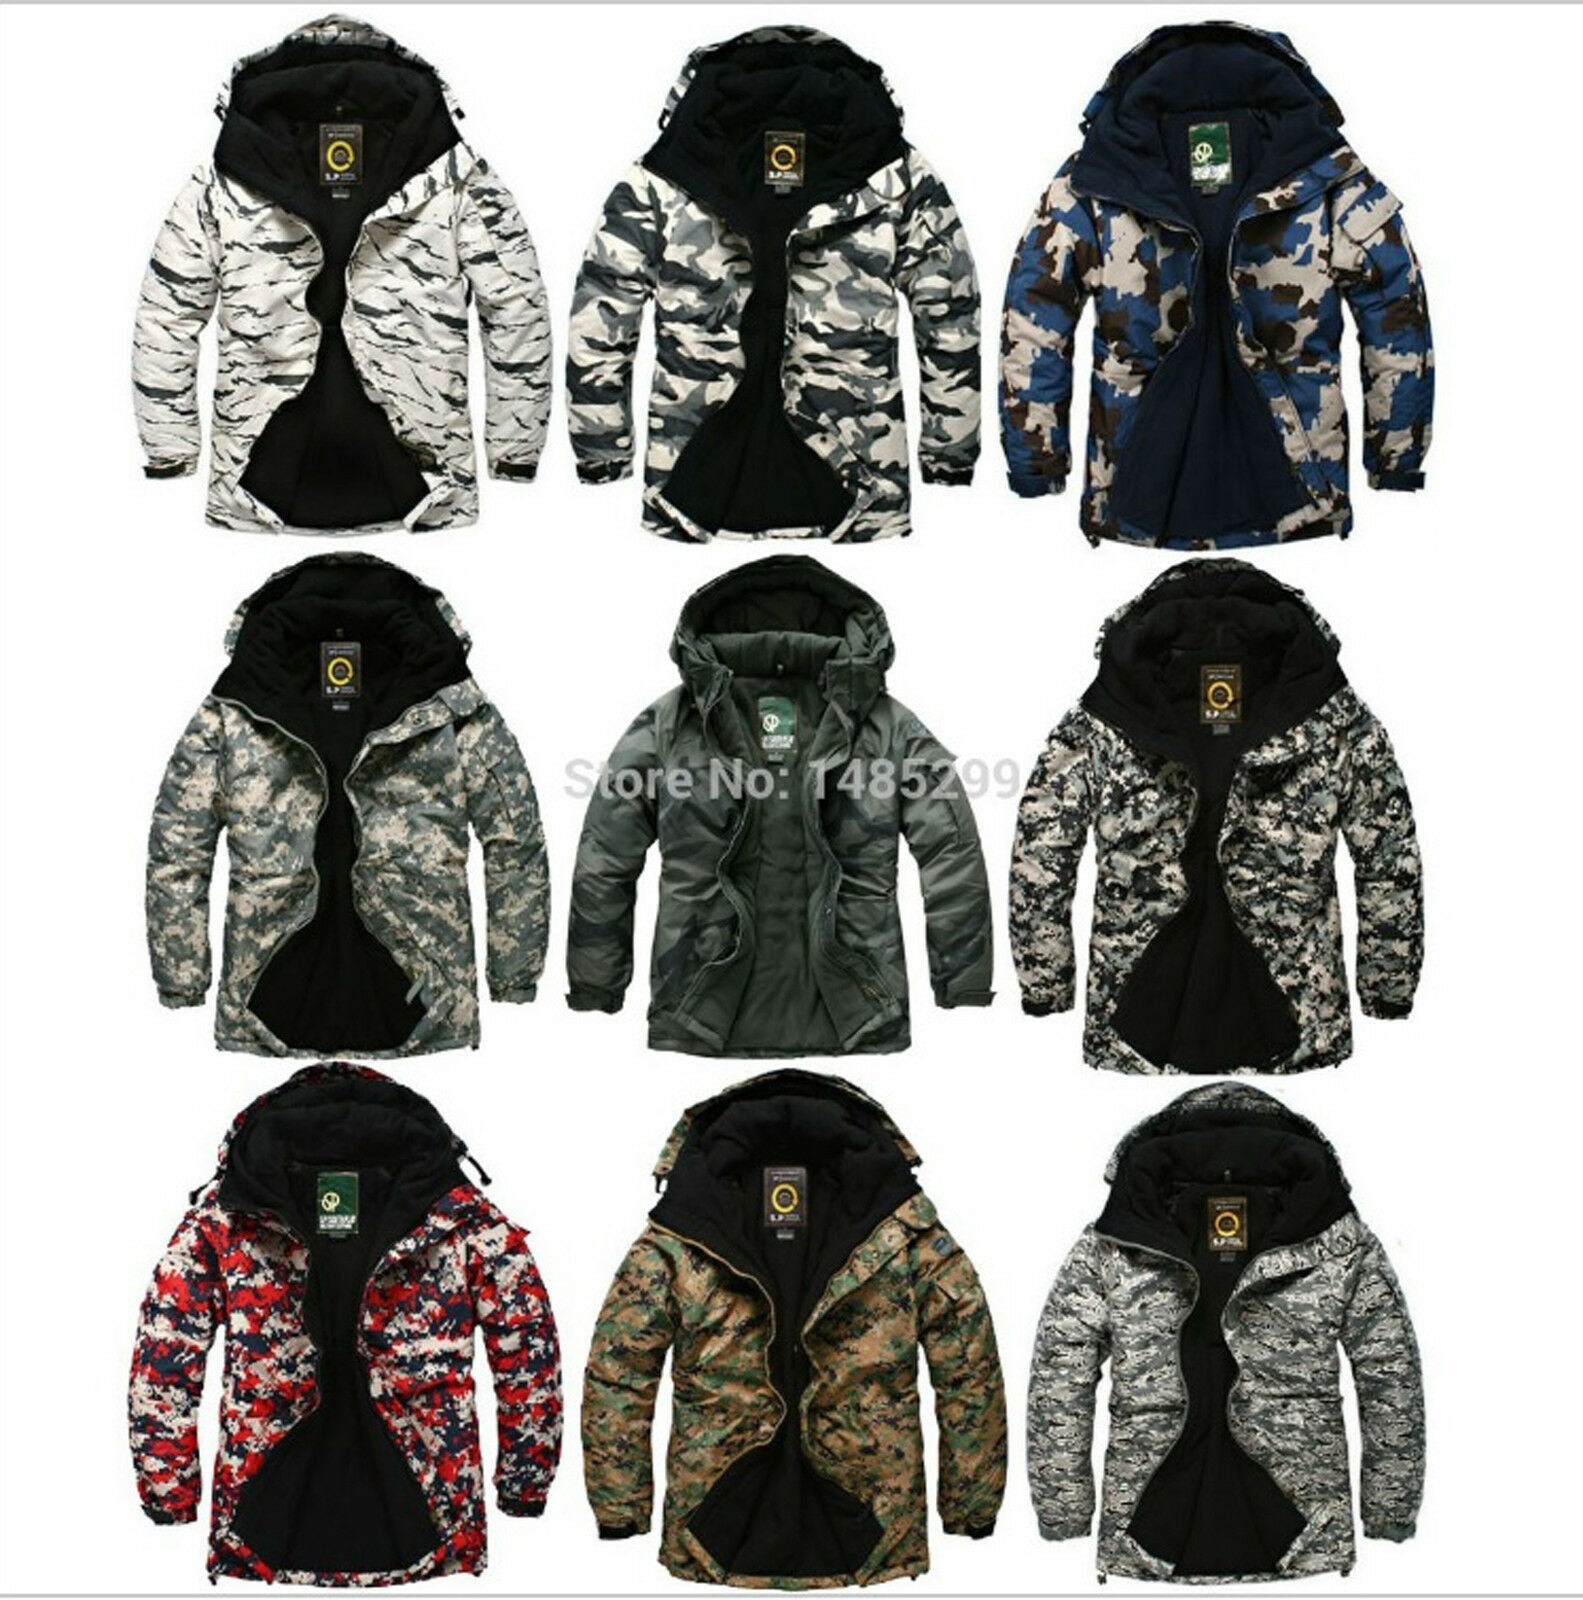 Mens Southplay Premium Waterproof Camo Military Ski-Snowboard Jackets MultiFarbe